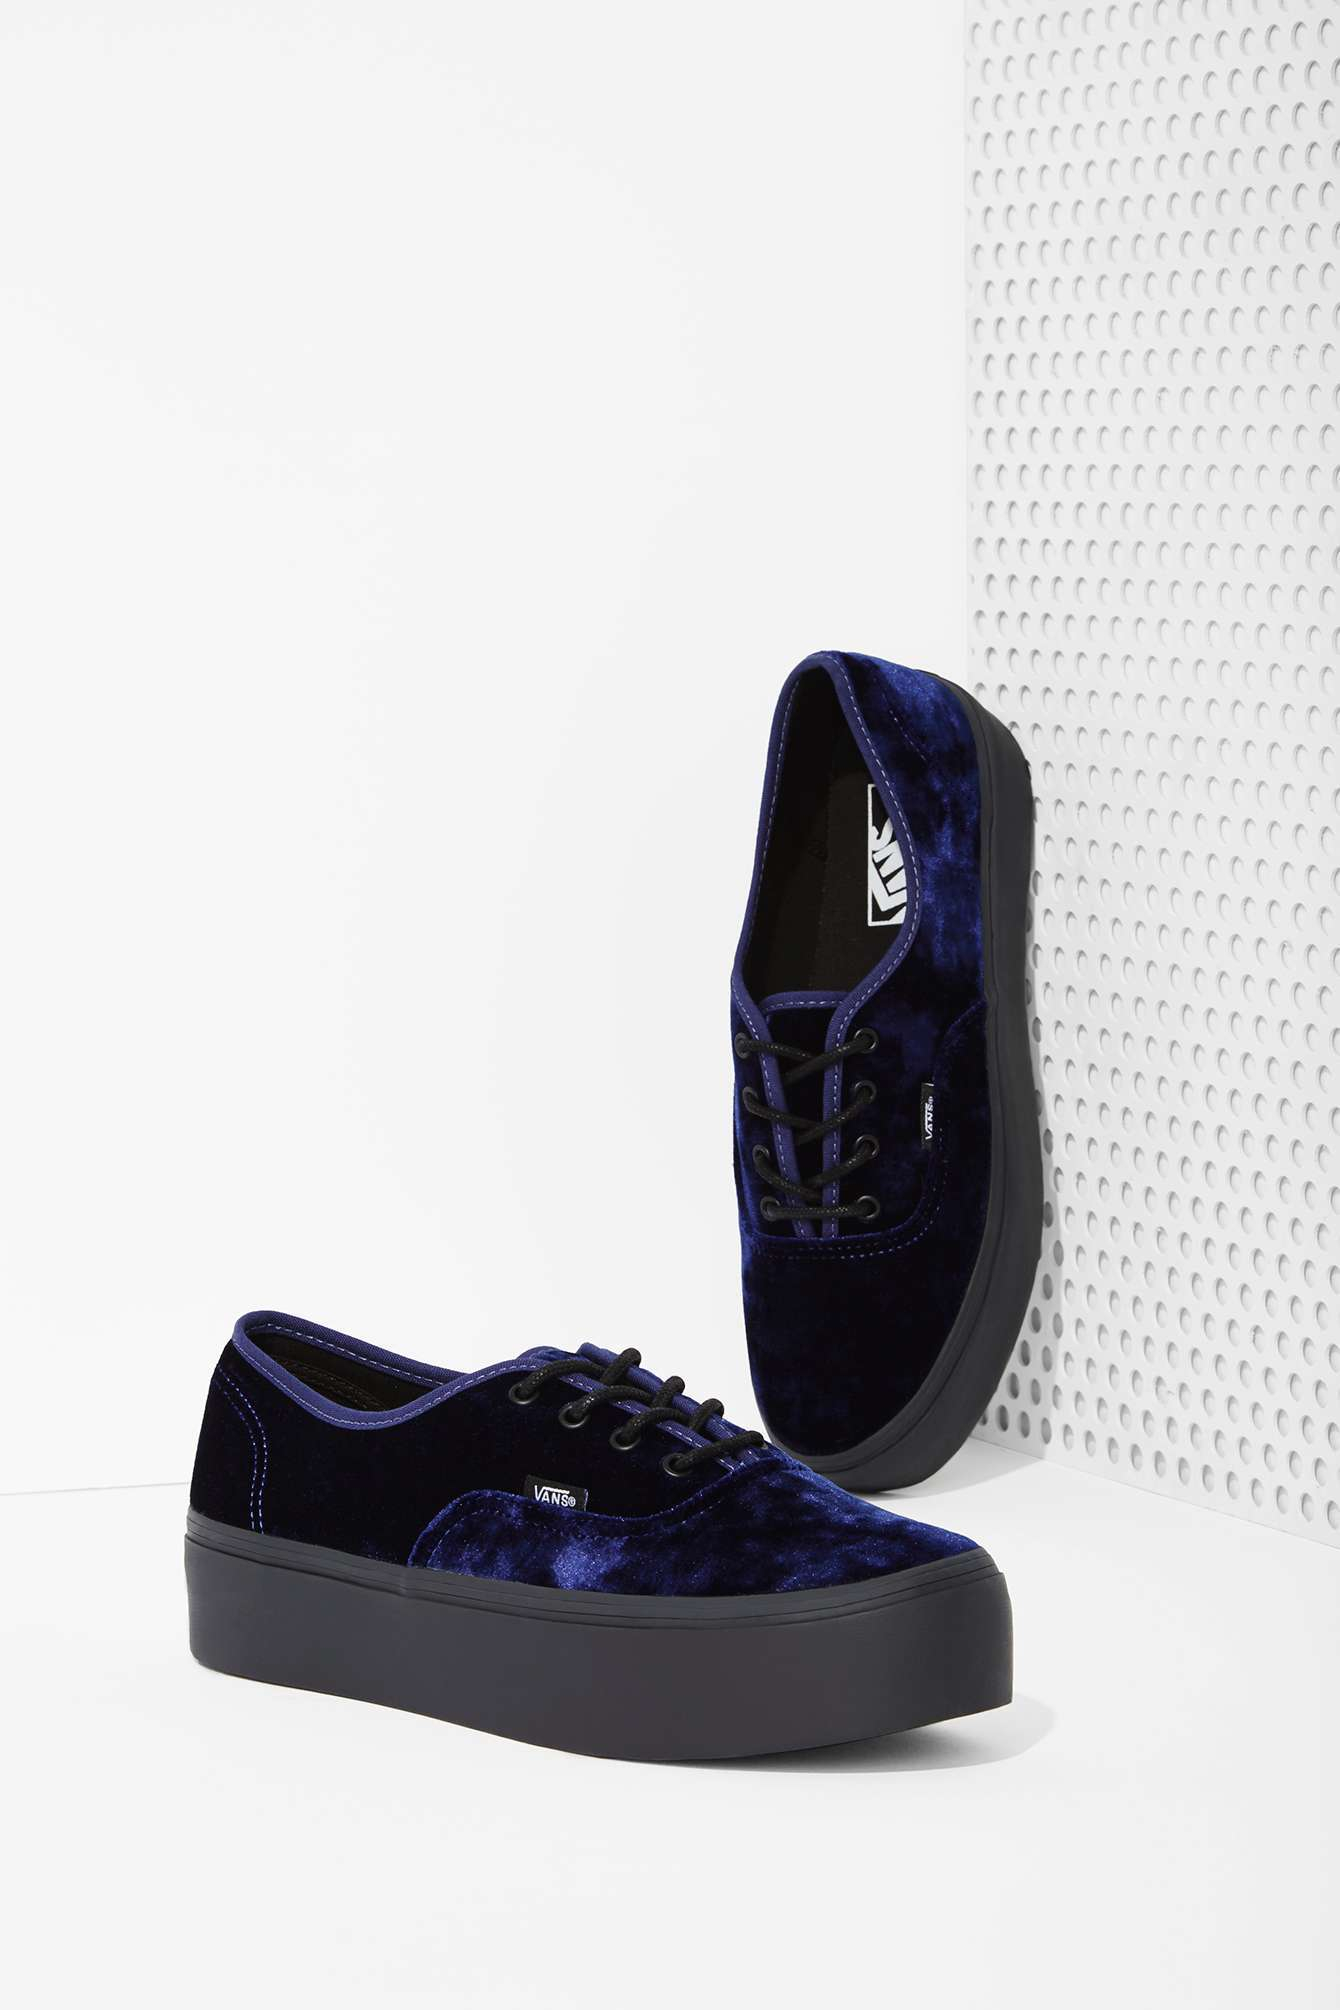 f5582a96439 Authentic Lyst In Sneaker Velvet Blue Nasty Platform Vans Gal 16FtxRwqv